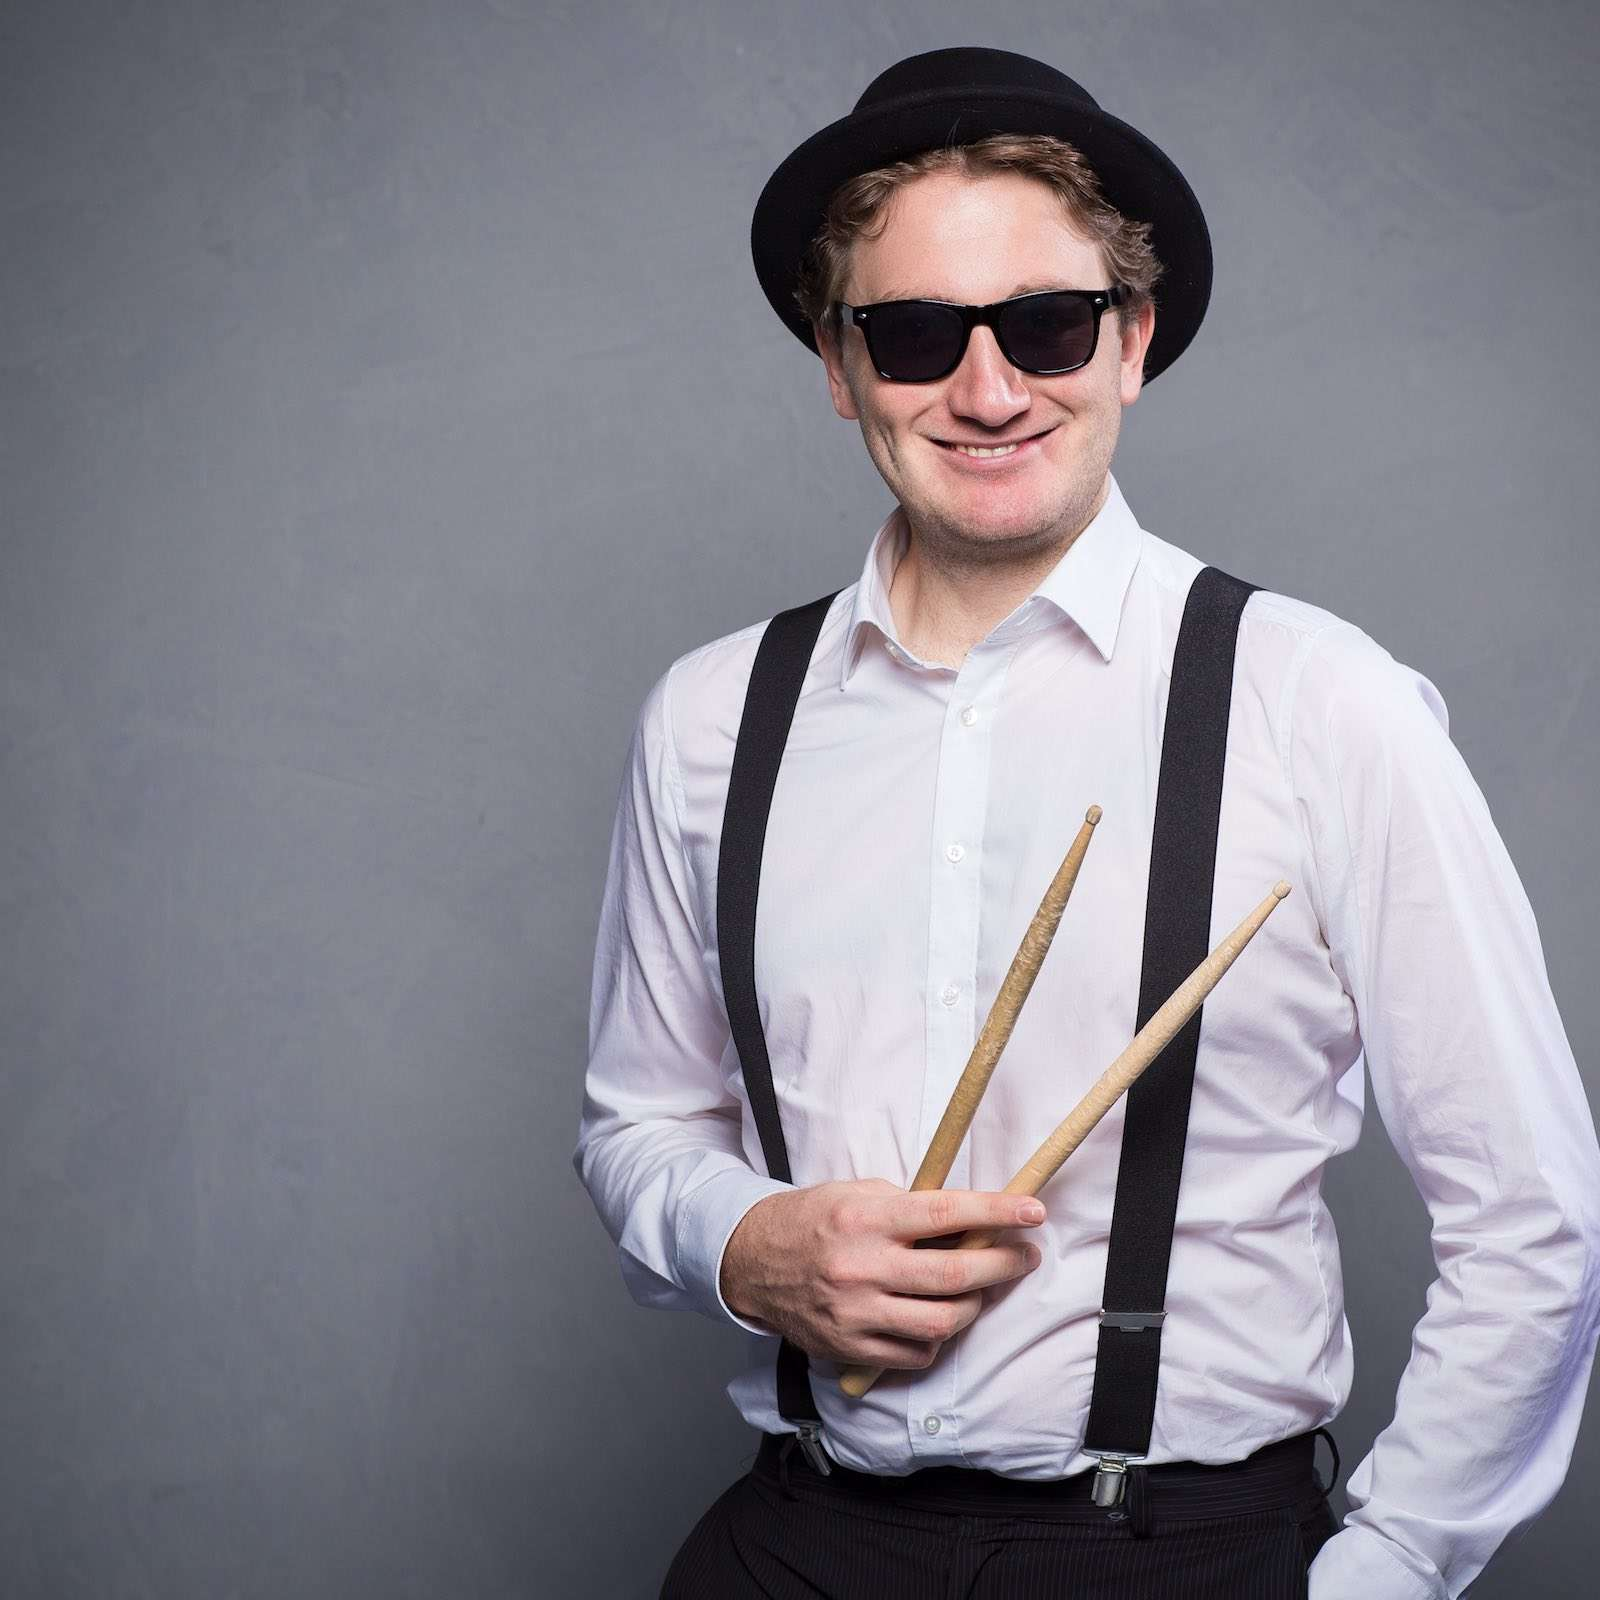 Jazzband | Hannover | Musiker | Livemusik | Liveband | Musiker | Partyband | Jazzband | Discomusik | Swingband | Schlagzeuger | Drums | Loungeband | Popband | Hochzeit | Empfang | Messe | Firmenfeier | Charity | Gala | Buchen